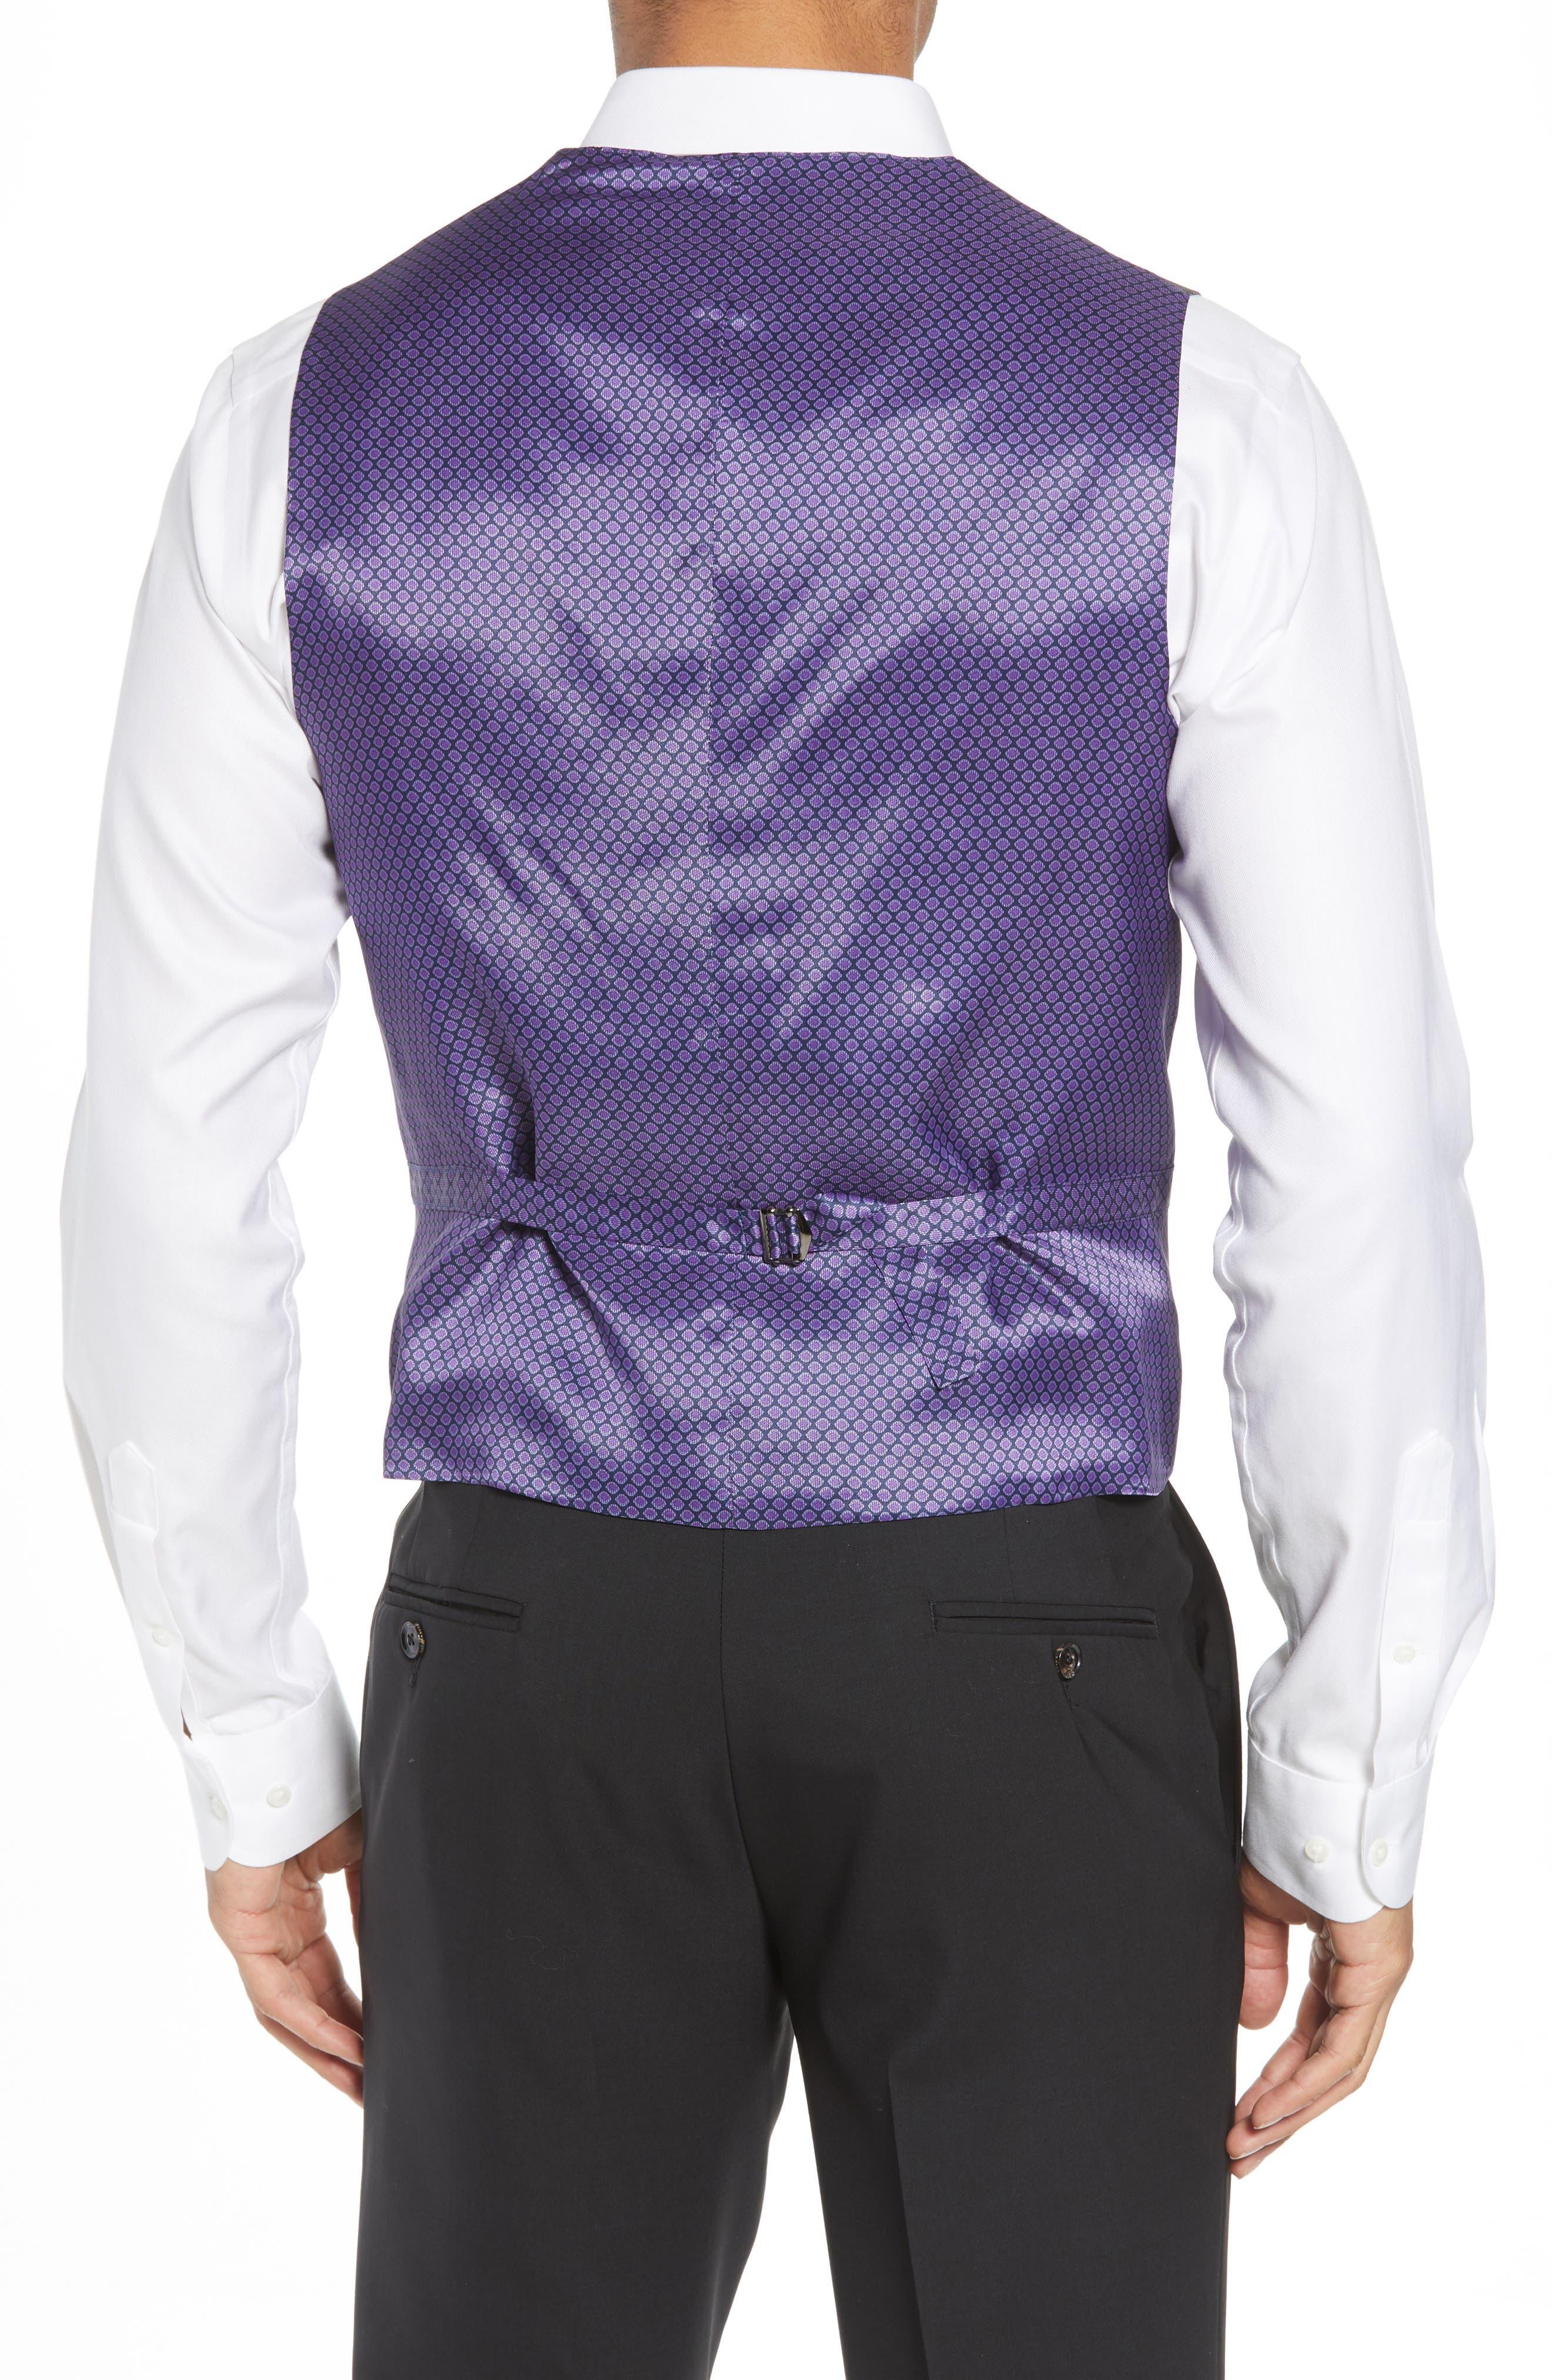 Troy Trim Fit Solid Wool Vest,                             Alternate thumbnail 2, color,                             LIGHT GREY